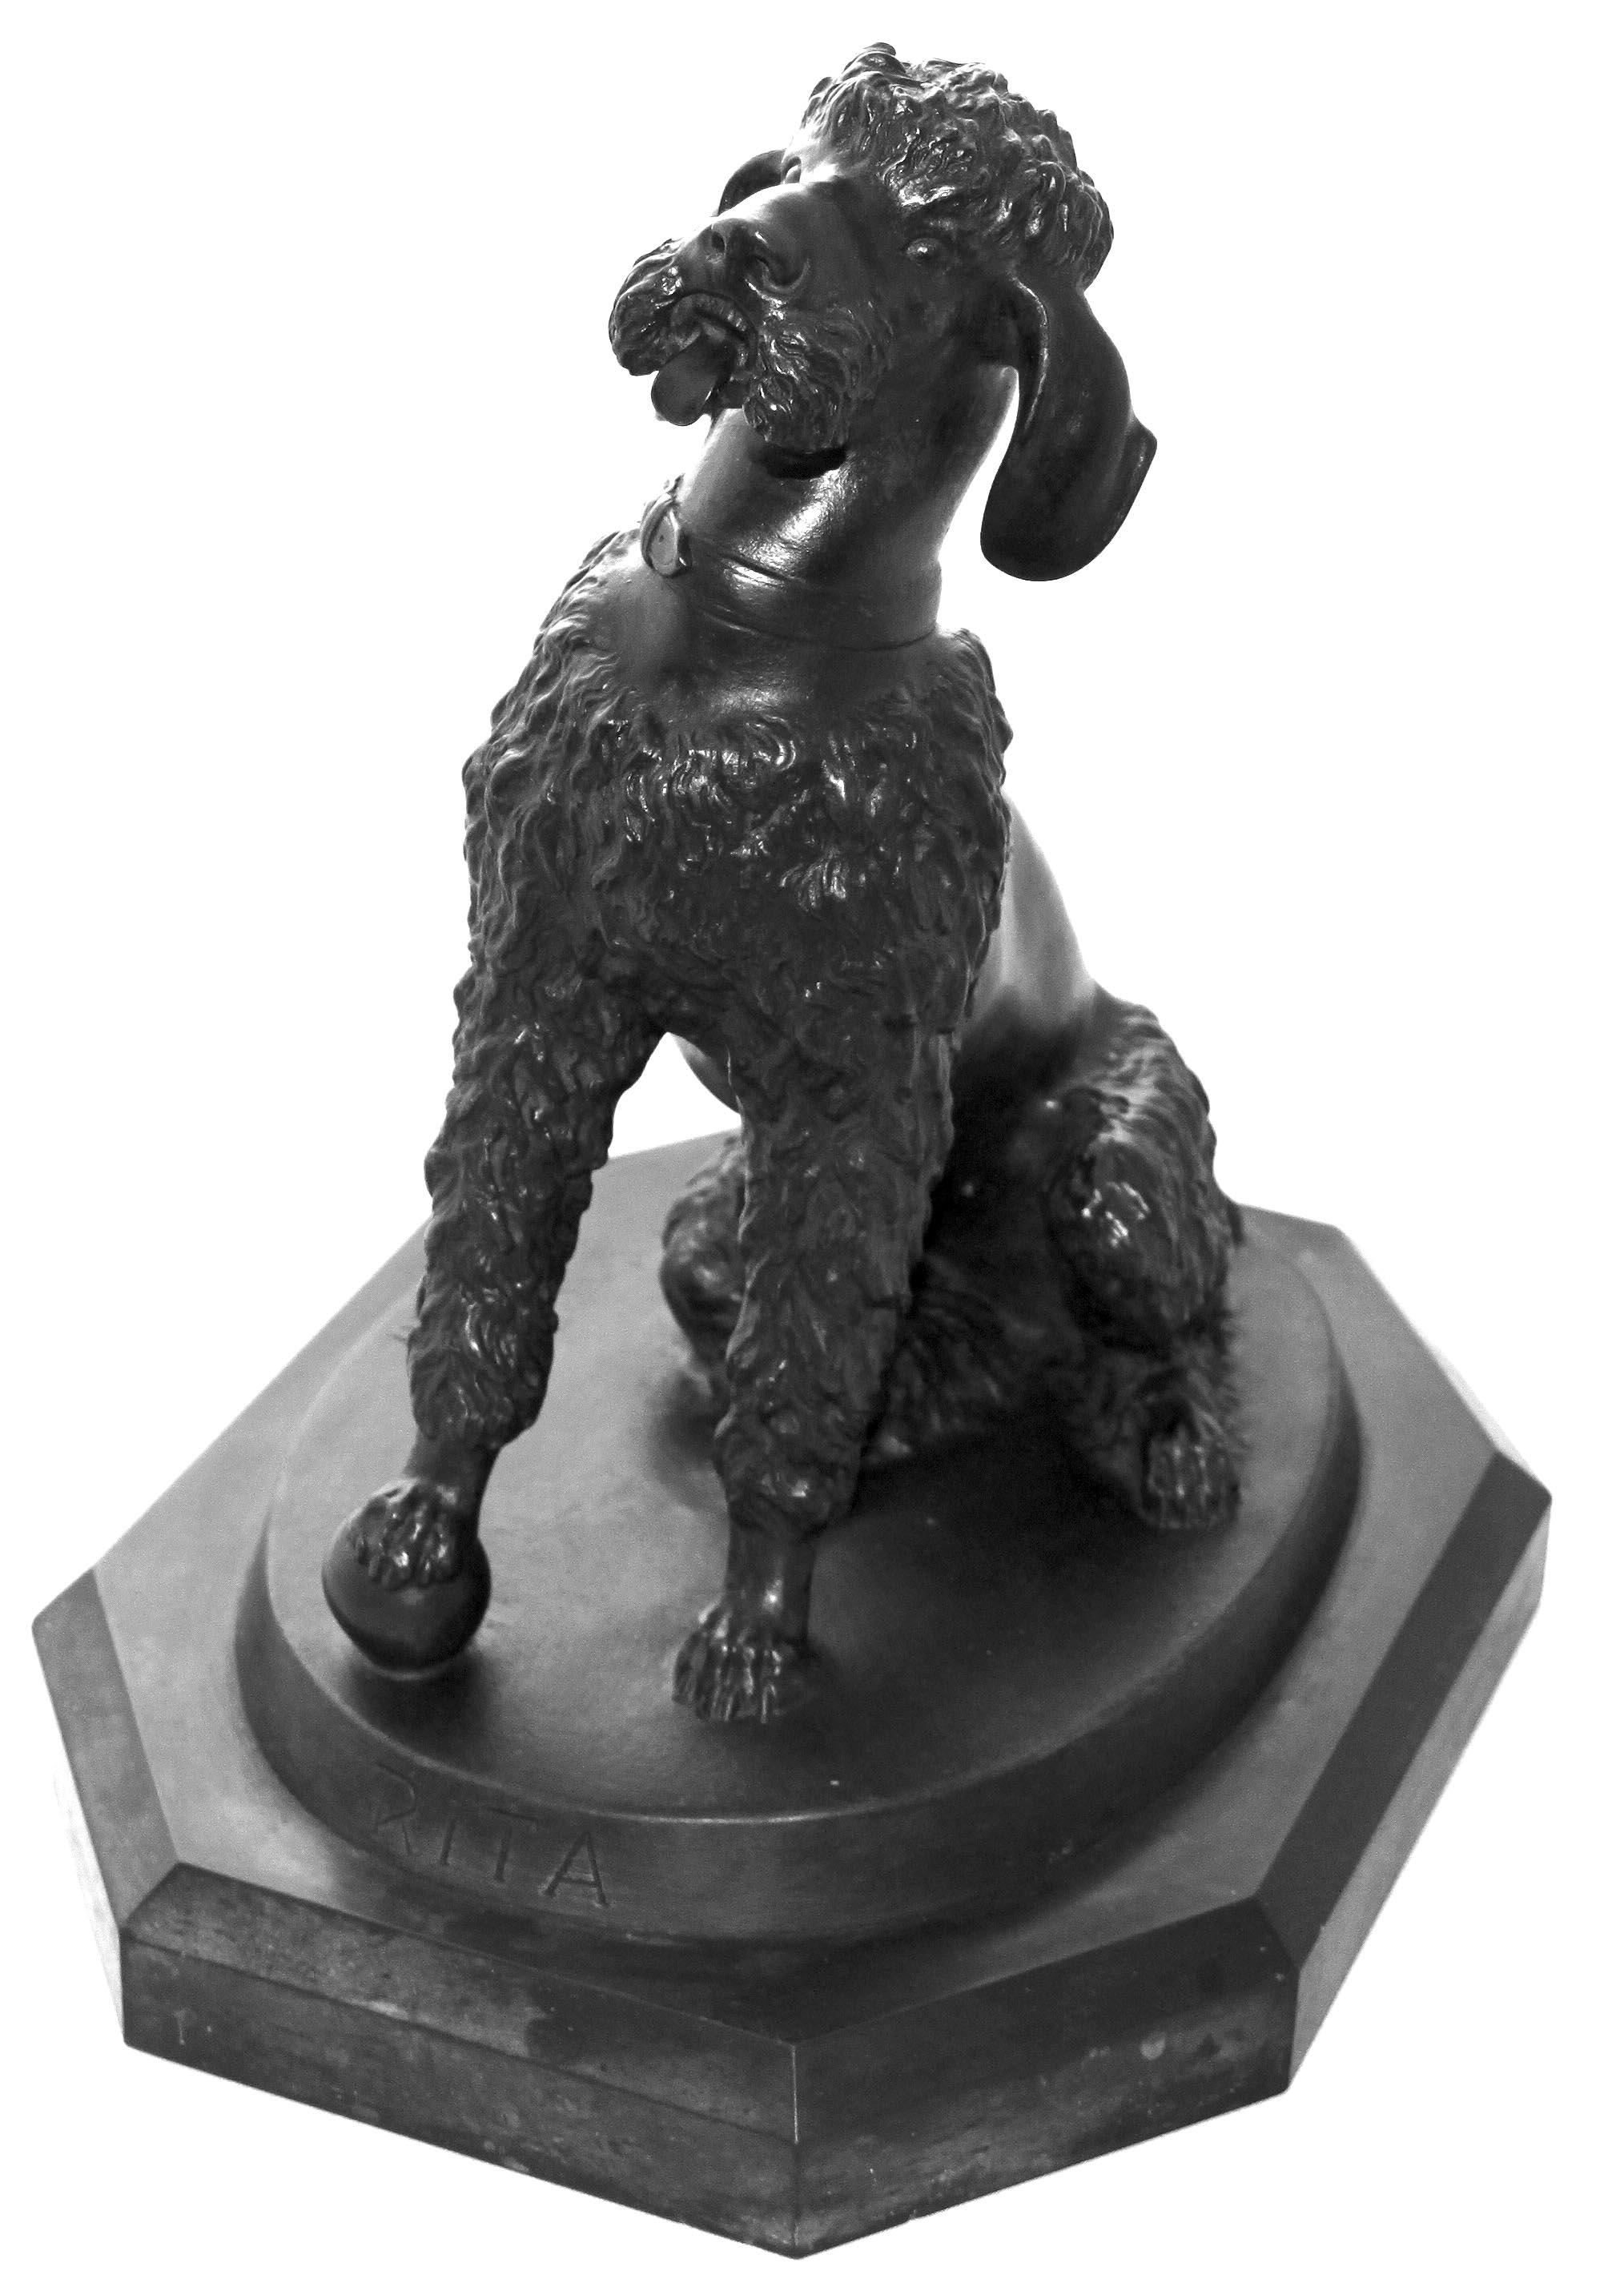 barry sculpteur animalier